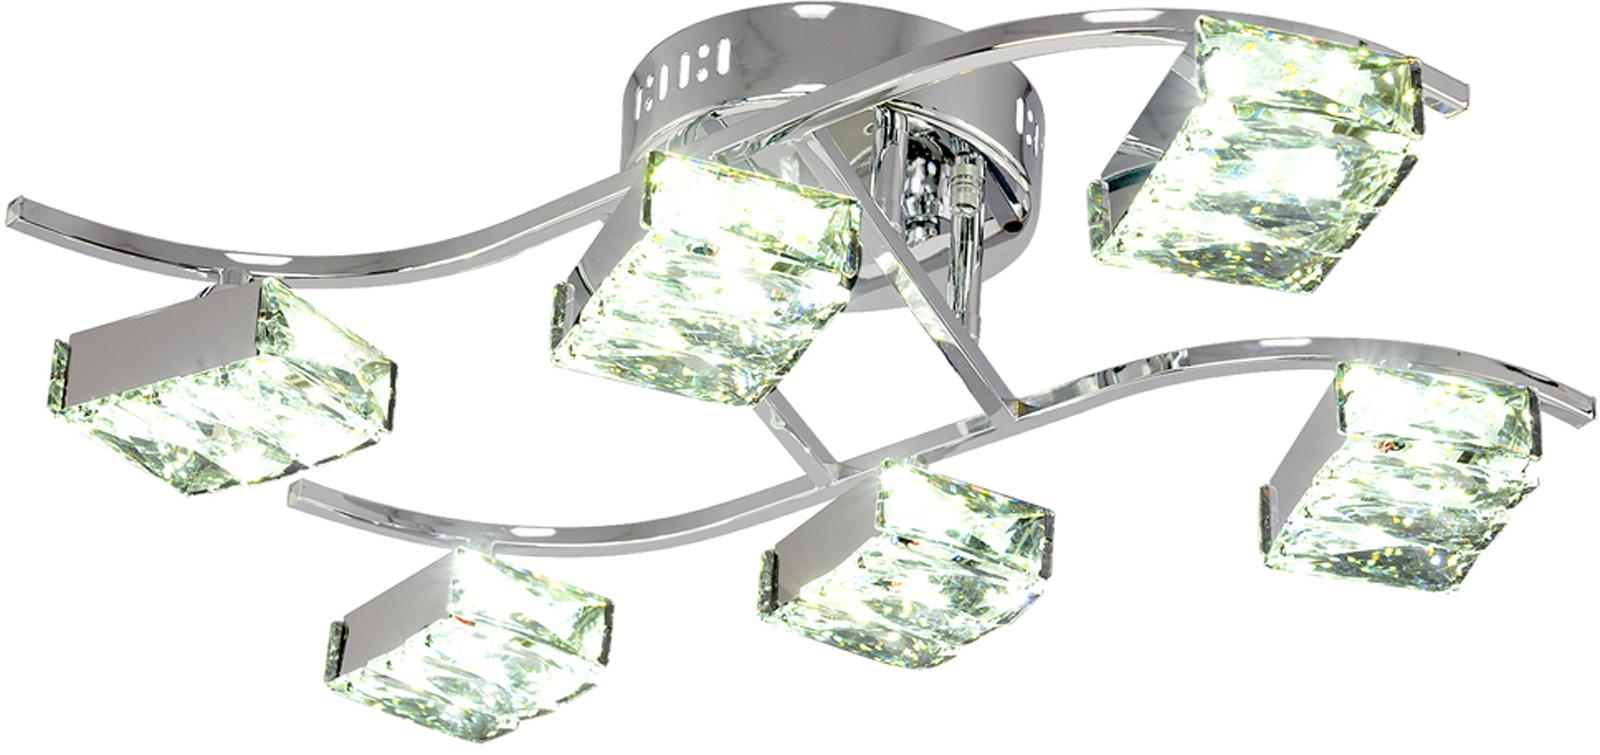 Потолочный светильник Максисвет 1663, 1-1663-6-CR Y LED, 570х350х160, LED, 8 Вт люстра максисвет геометрия 1 1696 6 cr y led